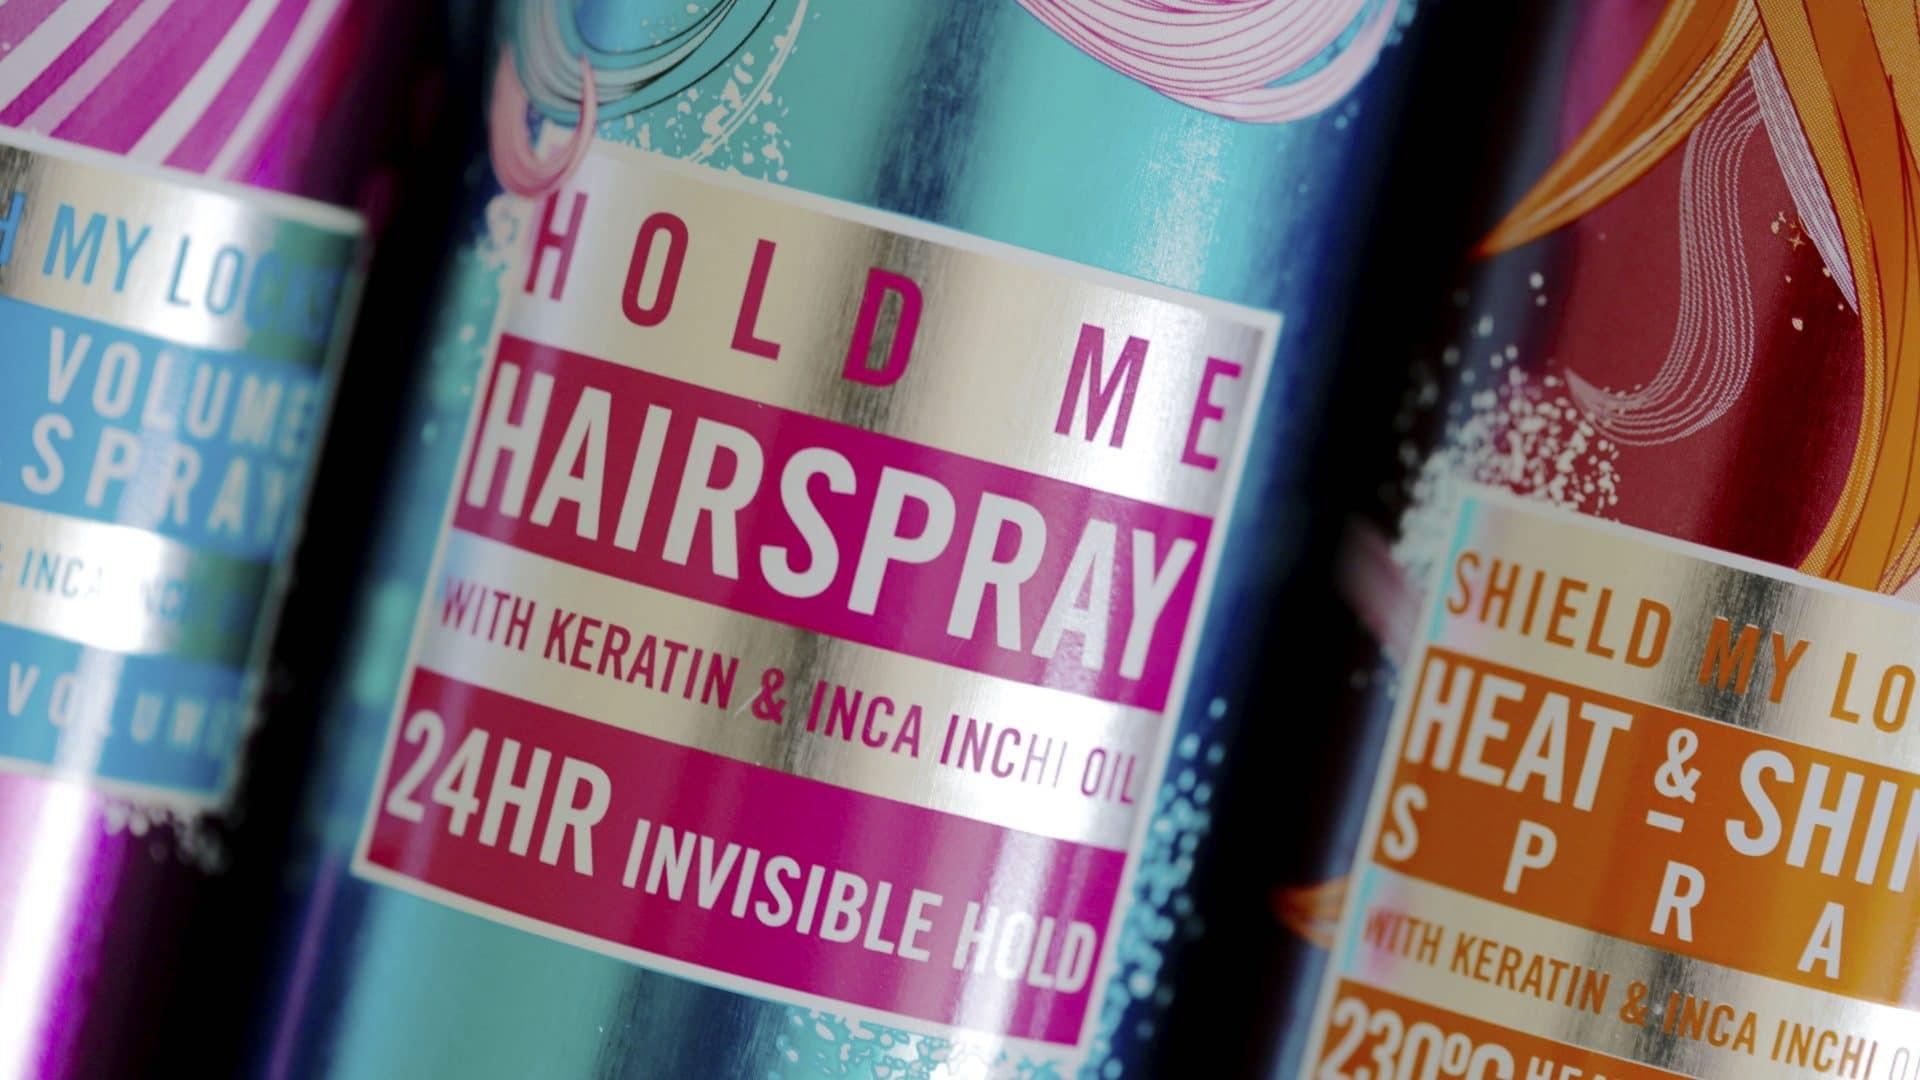 antifrizz-hairspray-hold